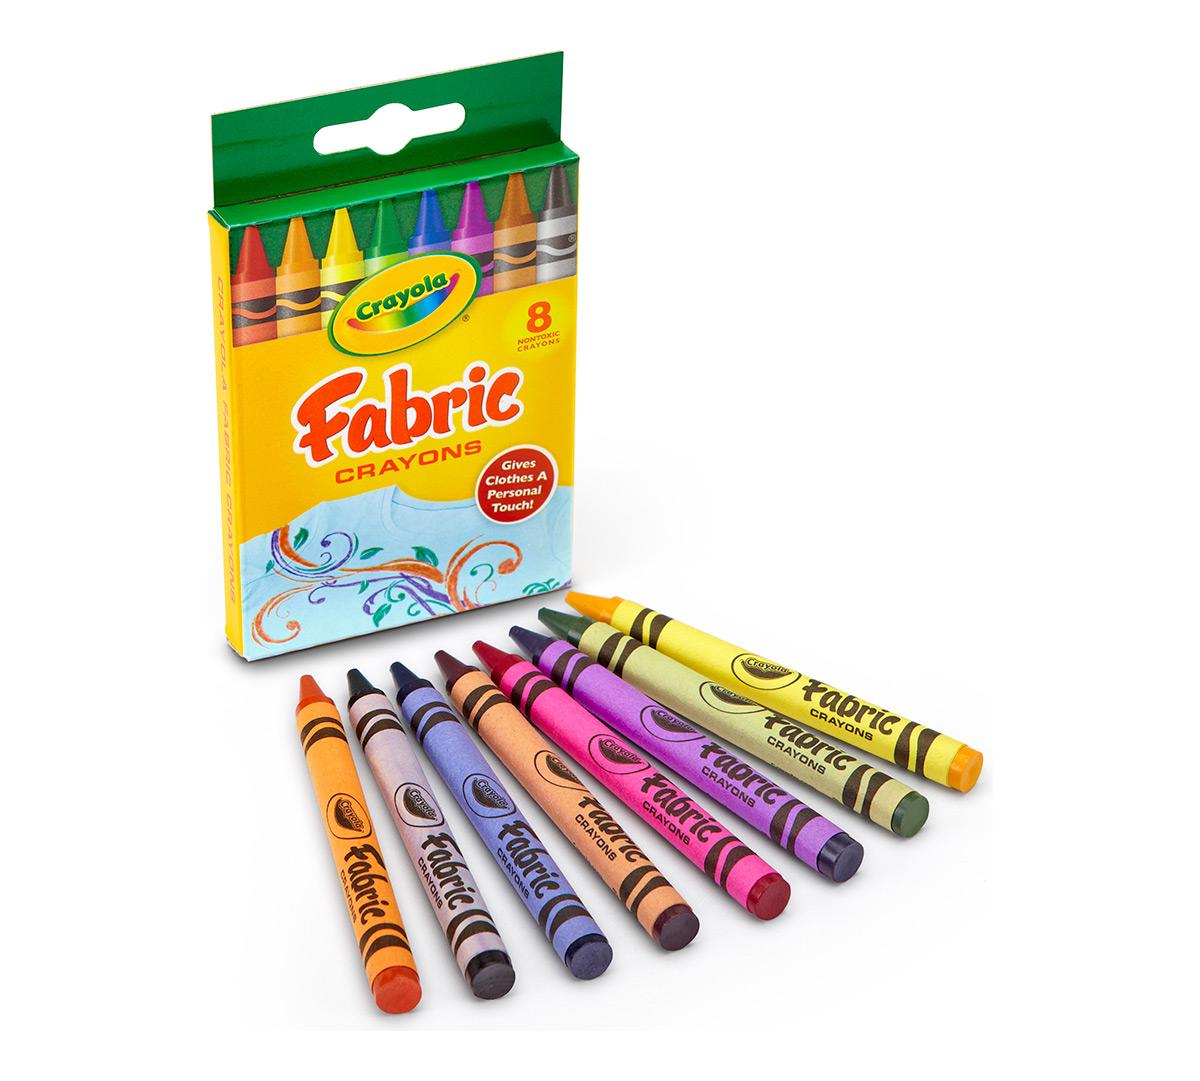 Fabric Crayons 8 ct. | Crayola